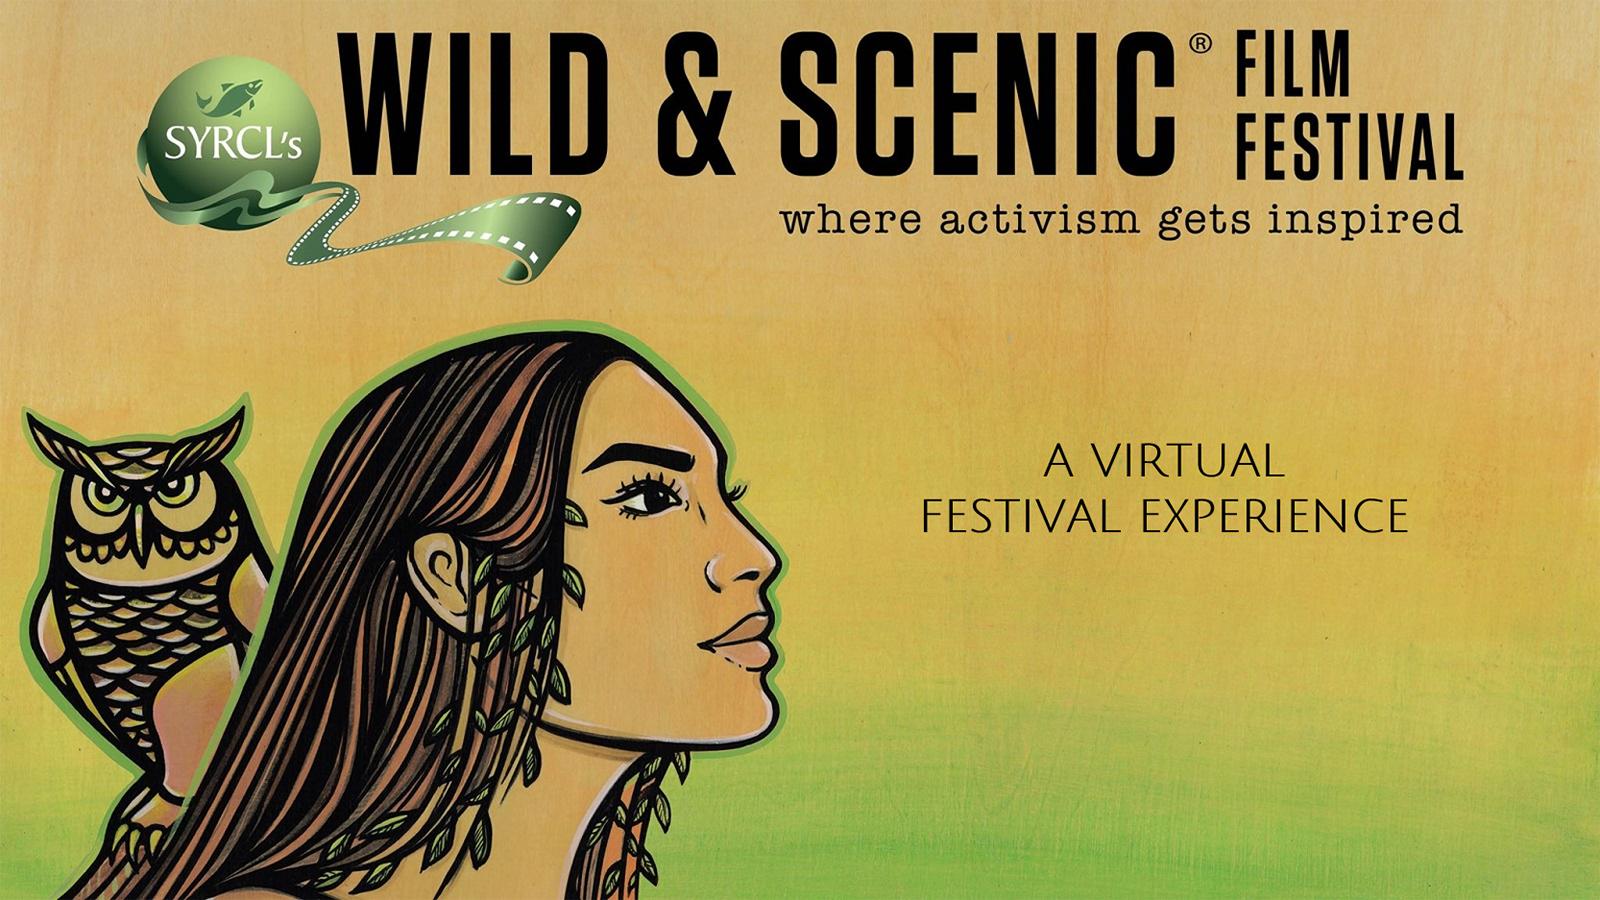 Main Street Pops Presents SYRCL's Wild & Scenic Film Festival On Tour - Wild Child